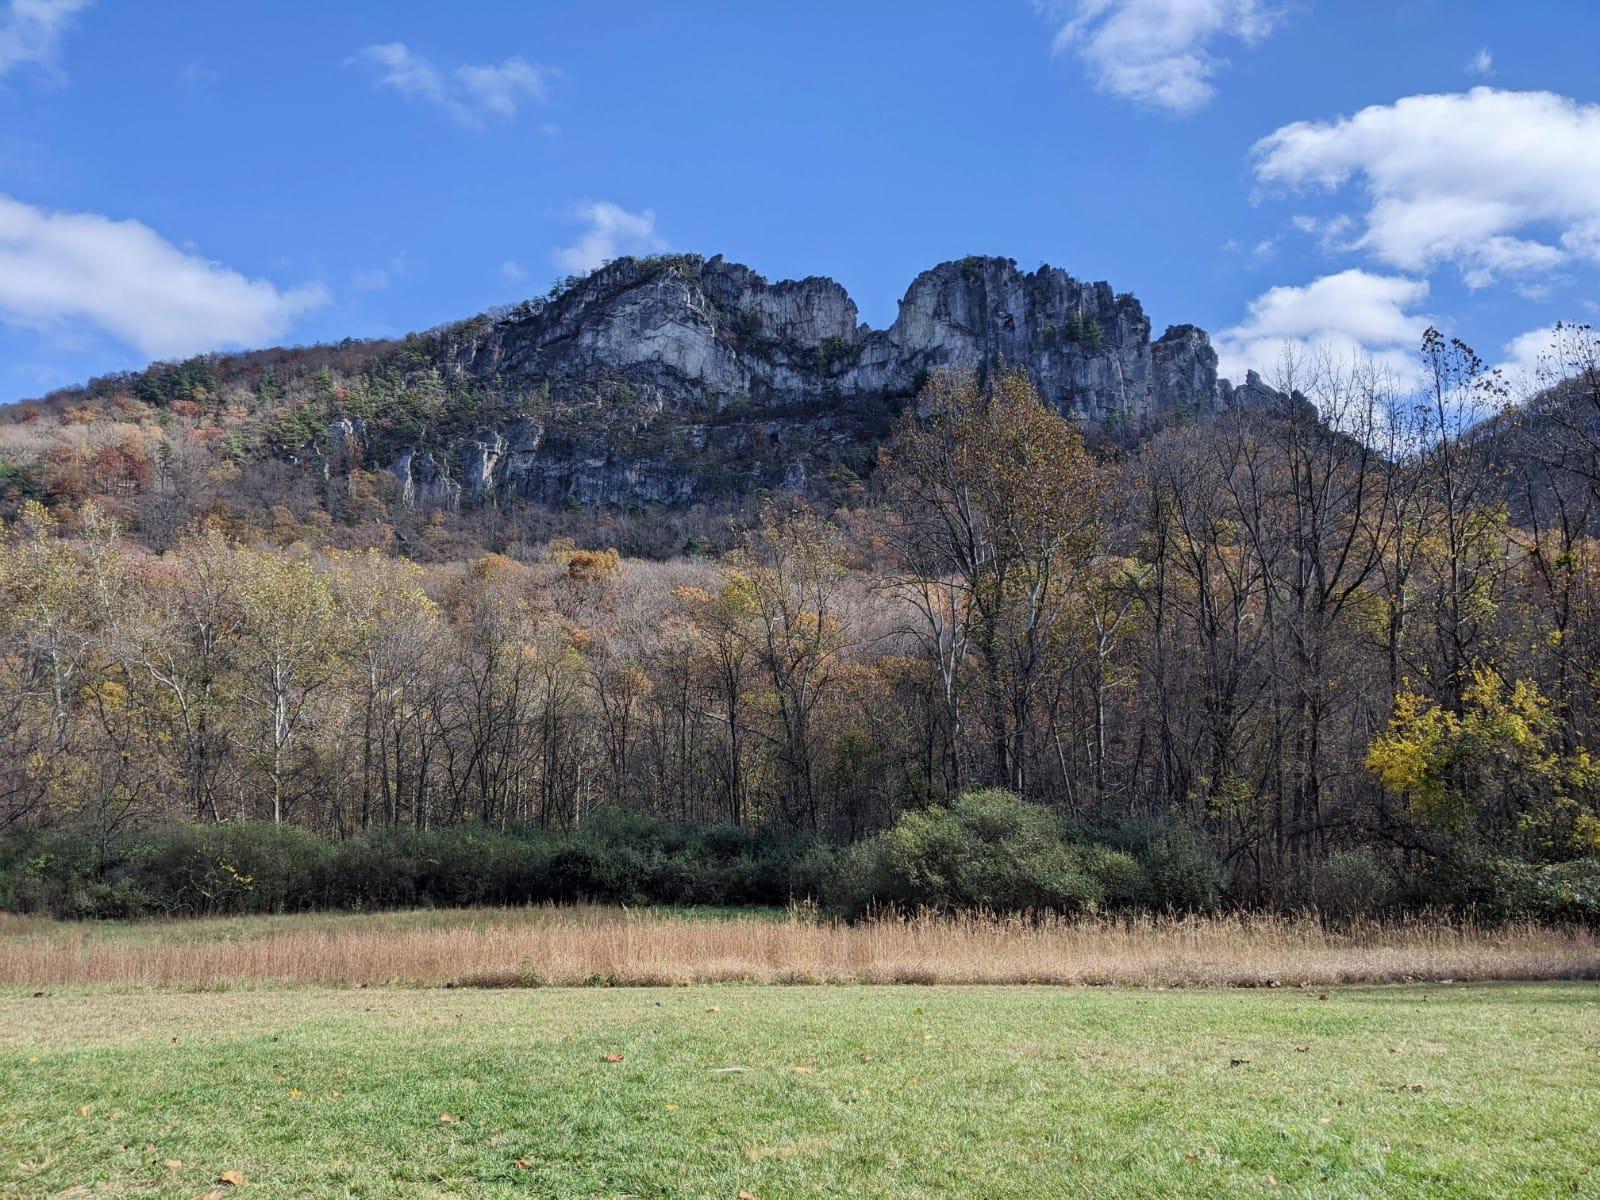 Seneca Rocks from below